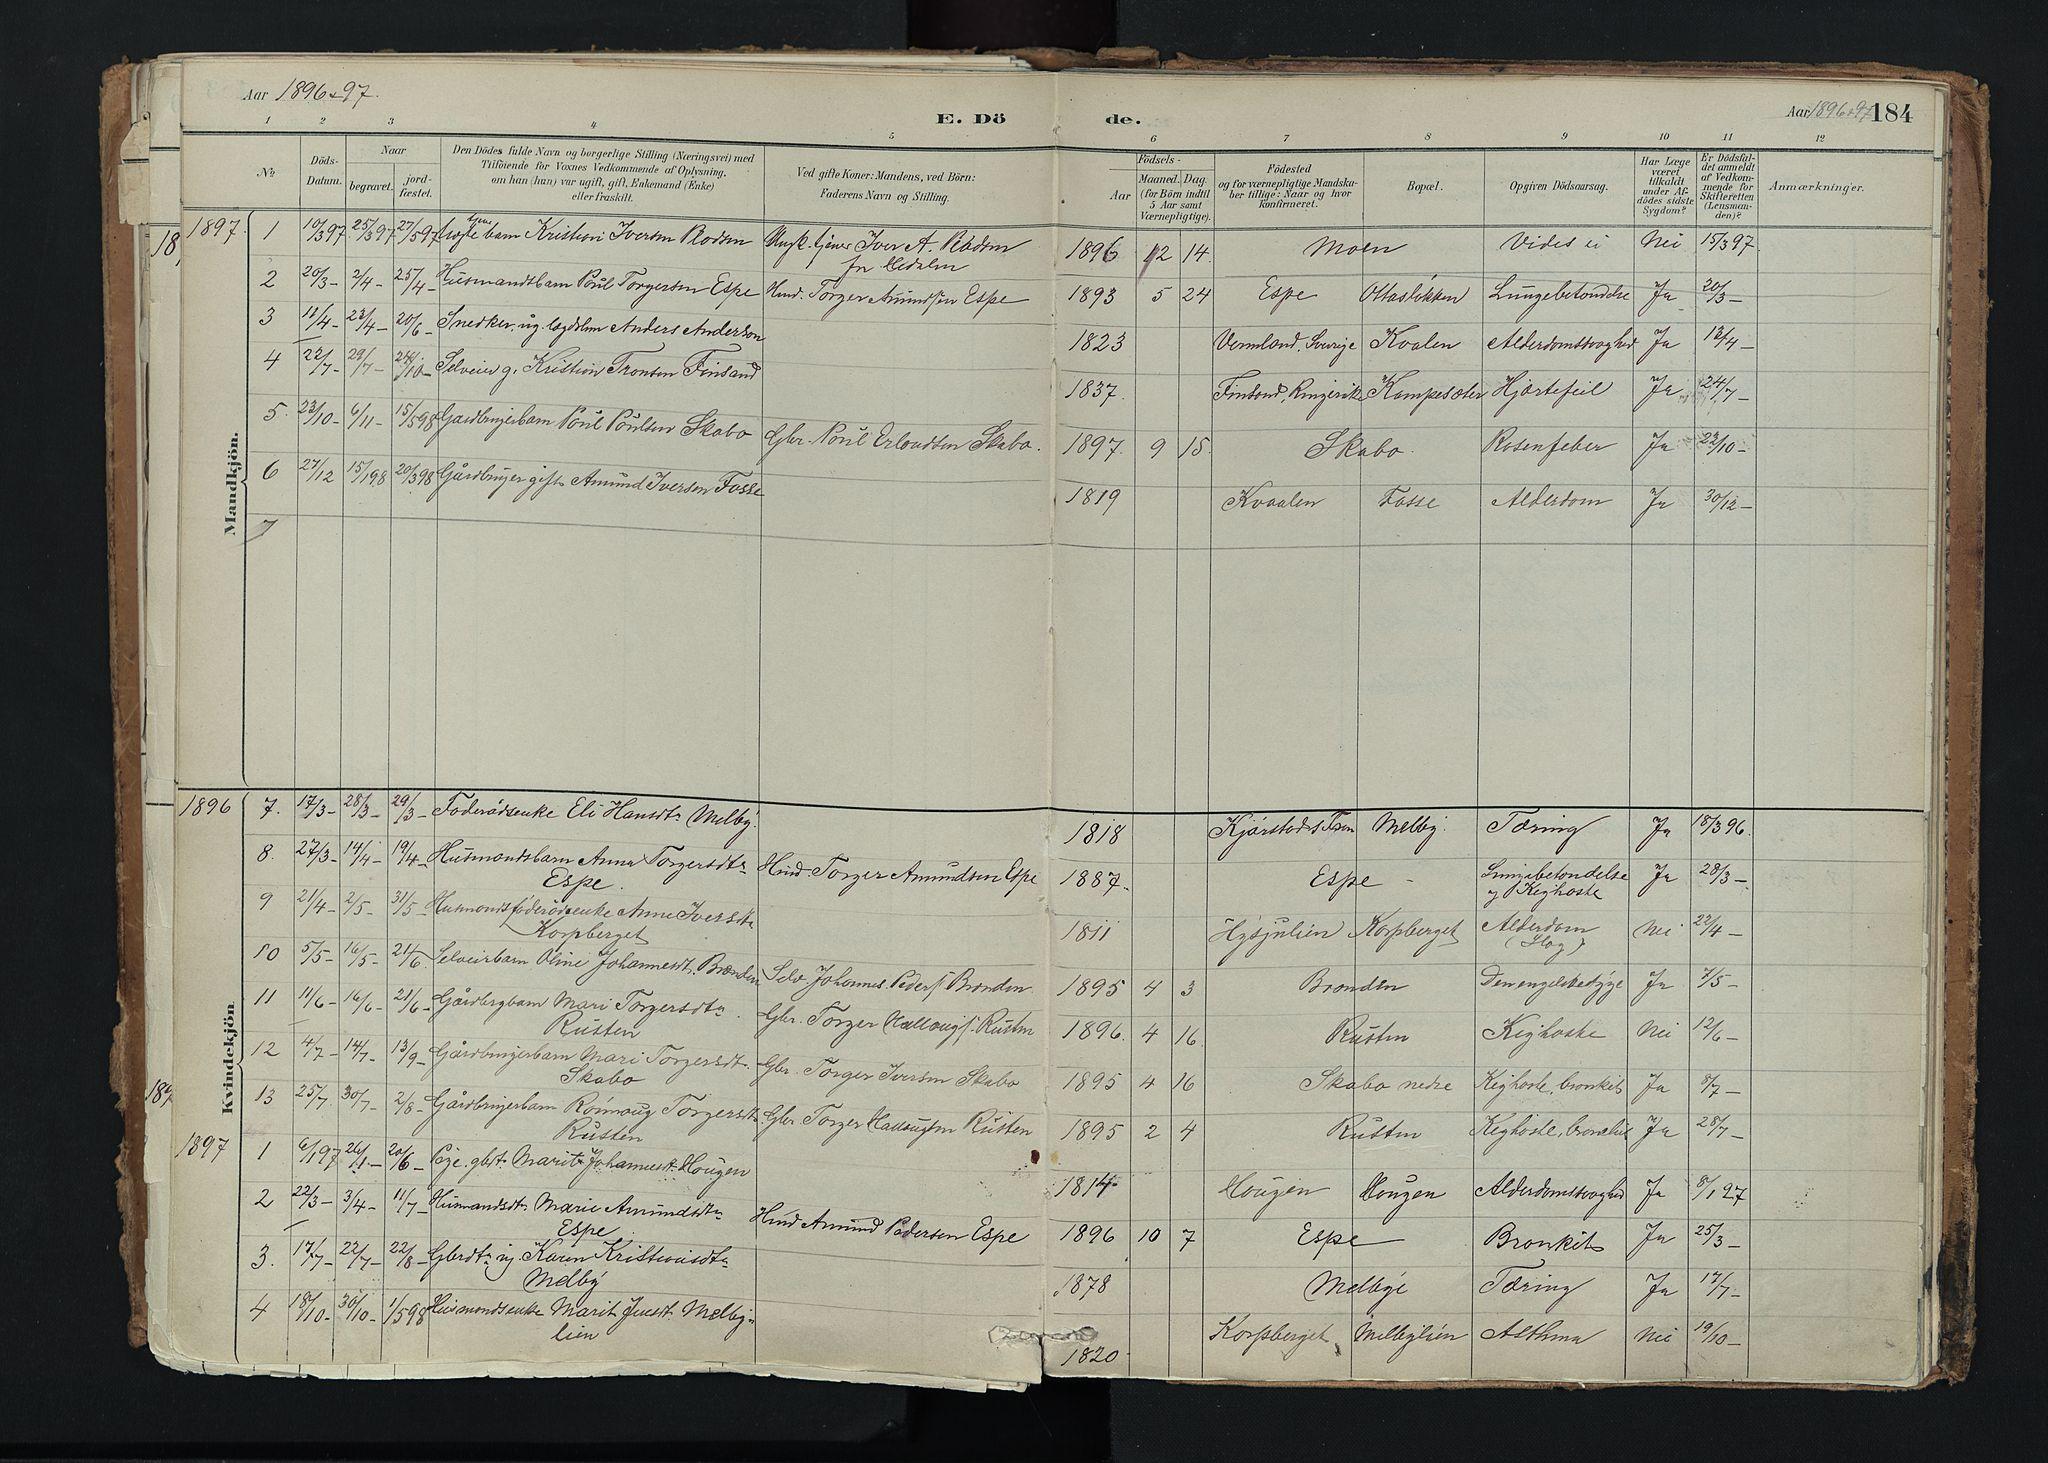 SAH, Nord-Fron prestekontor, Ministerialbok nr. 5, 1884-1914, s. 184